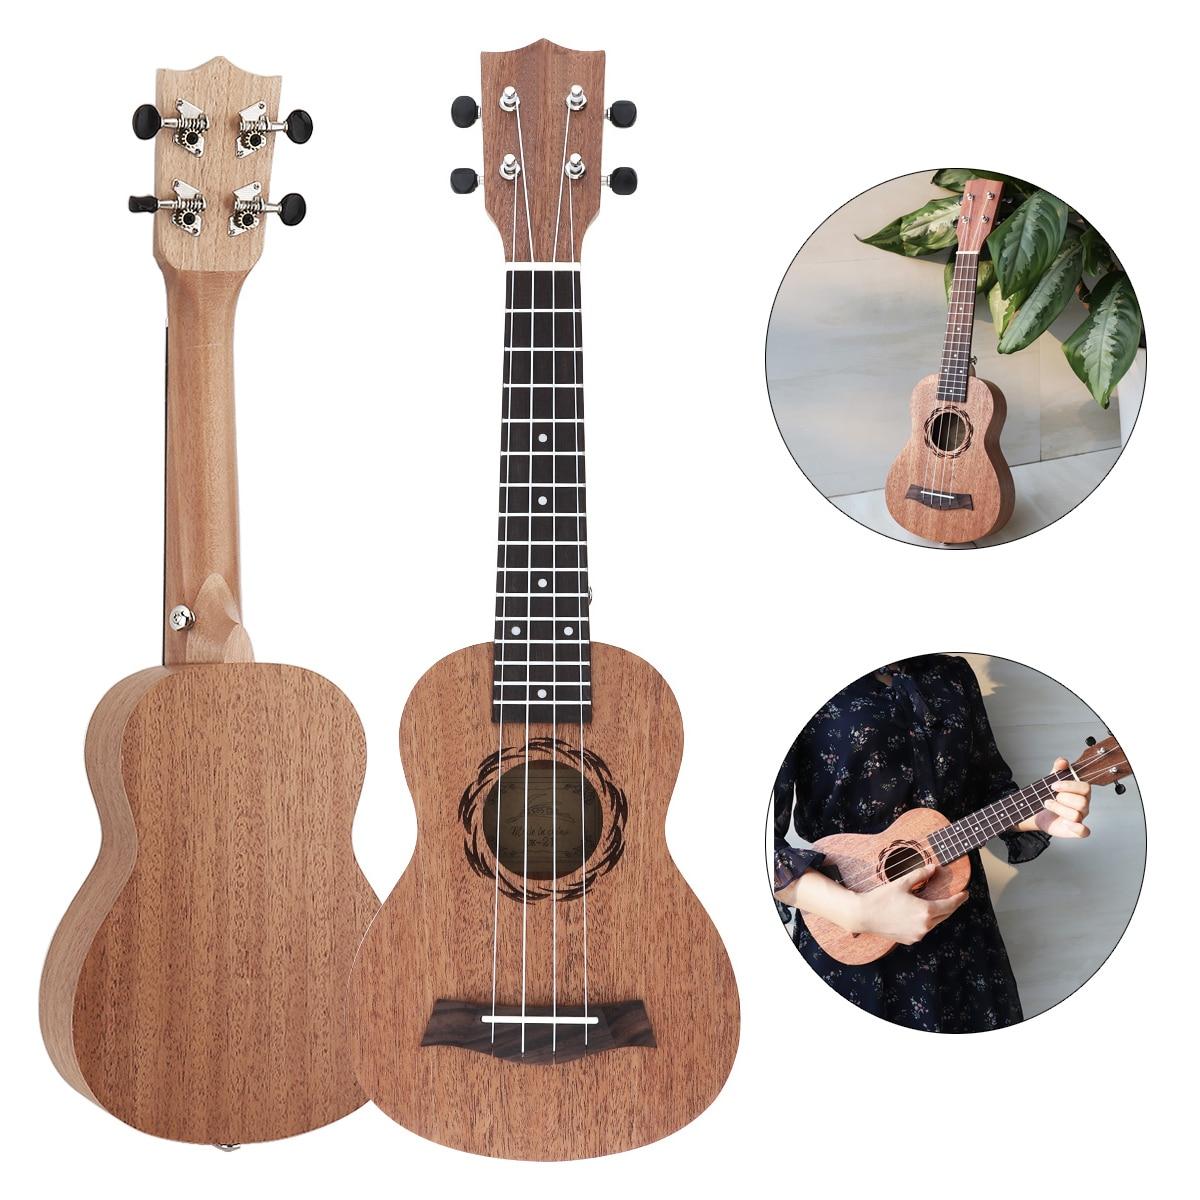 21 Inch Soprano Ukulele Sapele Wood 15 Fret Four Strings Hawaii Guitar String Musical Instruments21 Inch Soprano Ukulele Sapele Wood 15 Fret Four Strings Hawaii Guitar String Musical Instruments